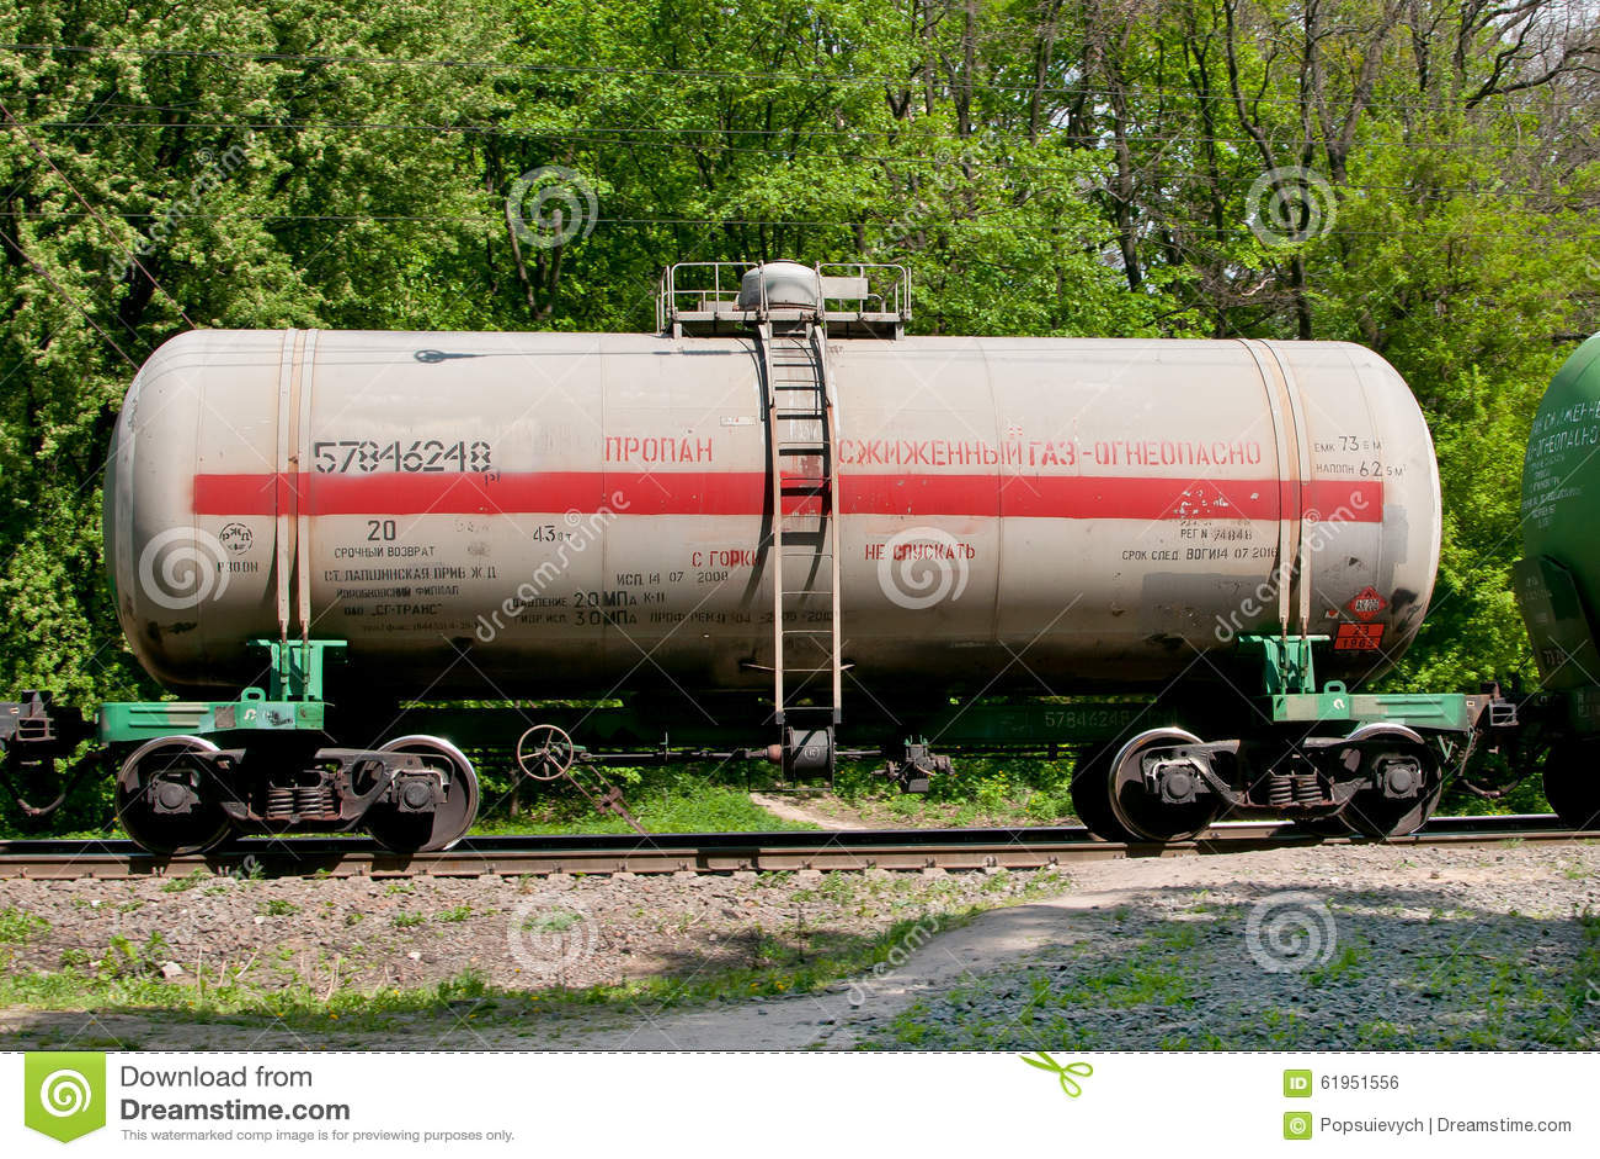 Ukraine Natural Gas Company